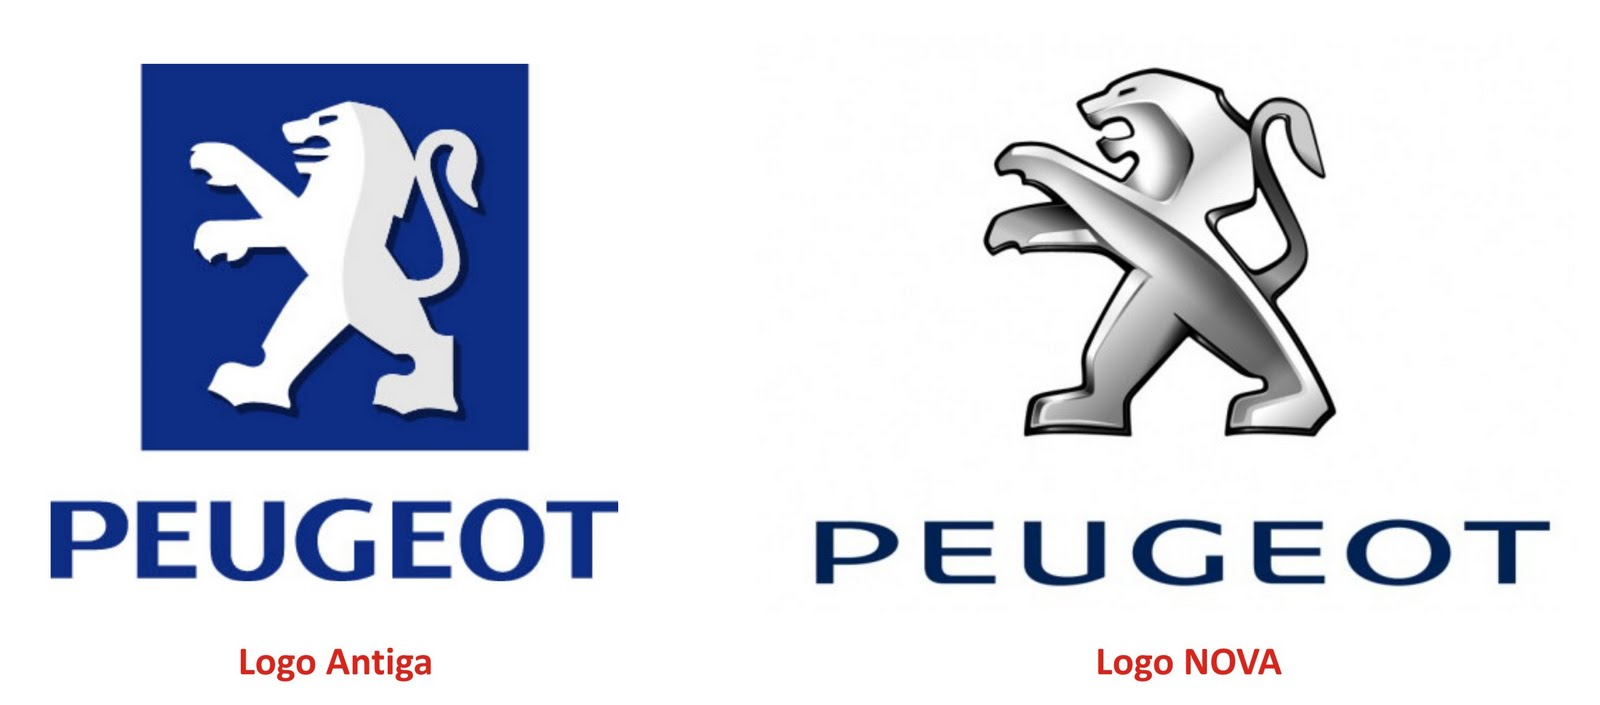 Peugeot Logos Trendy